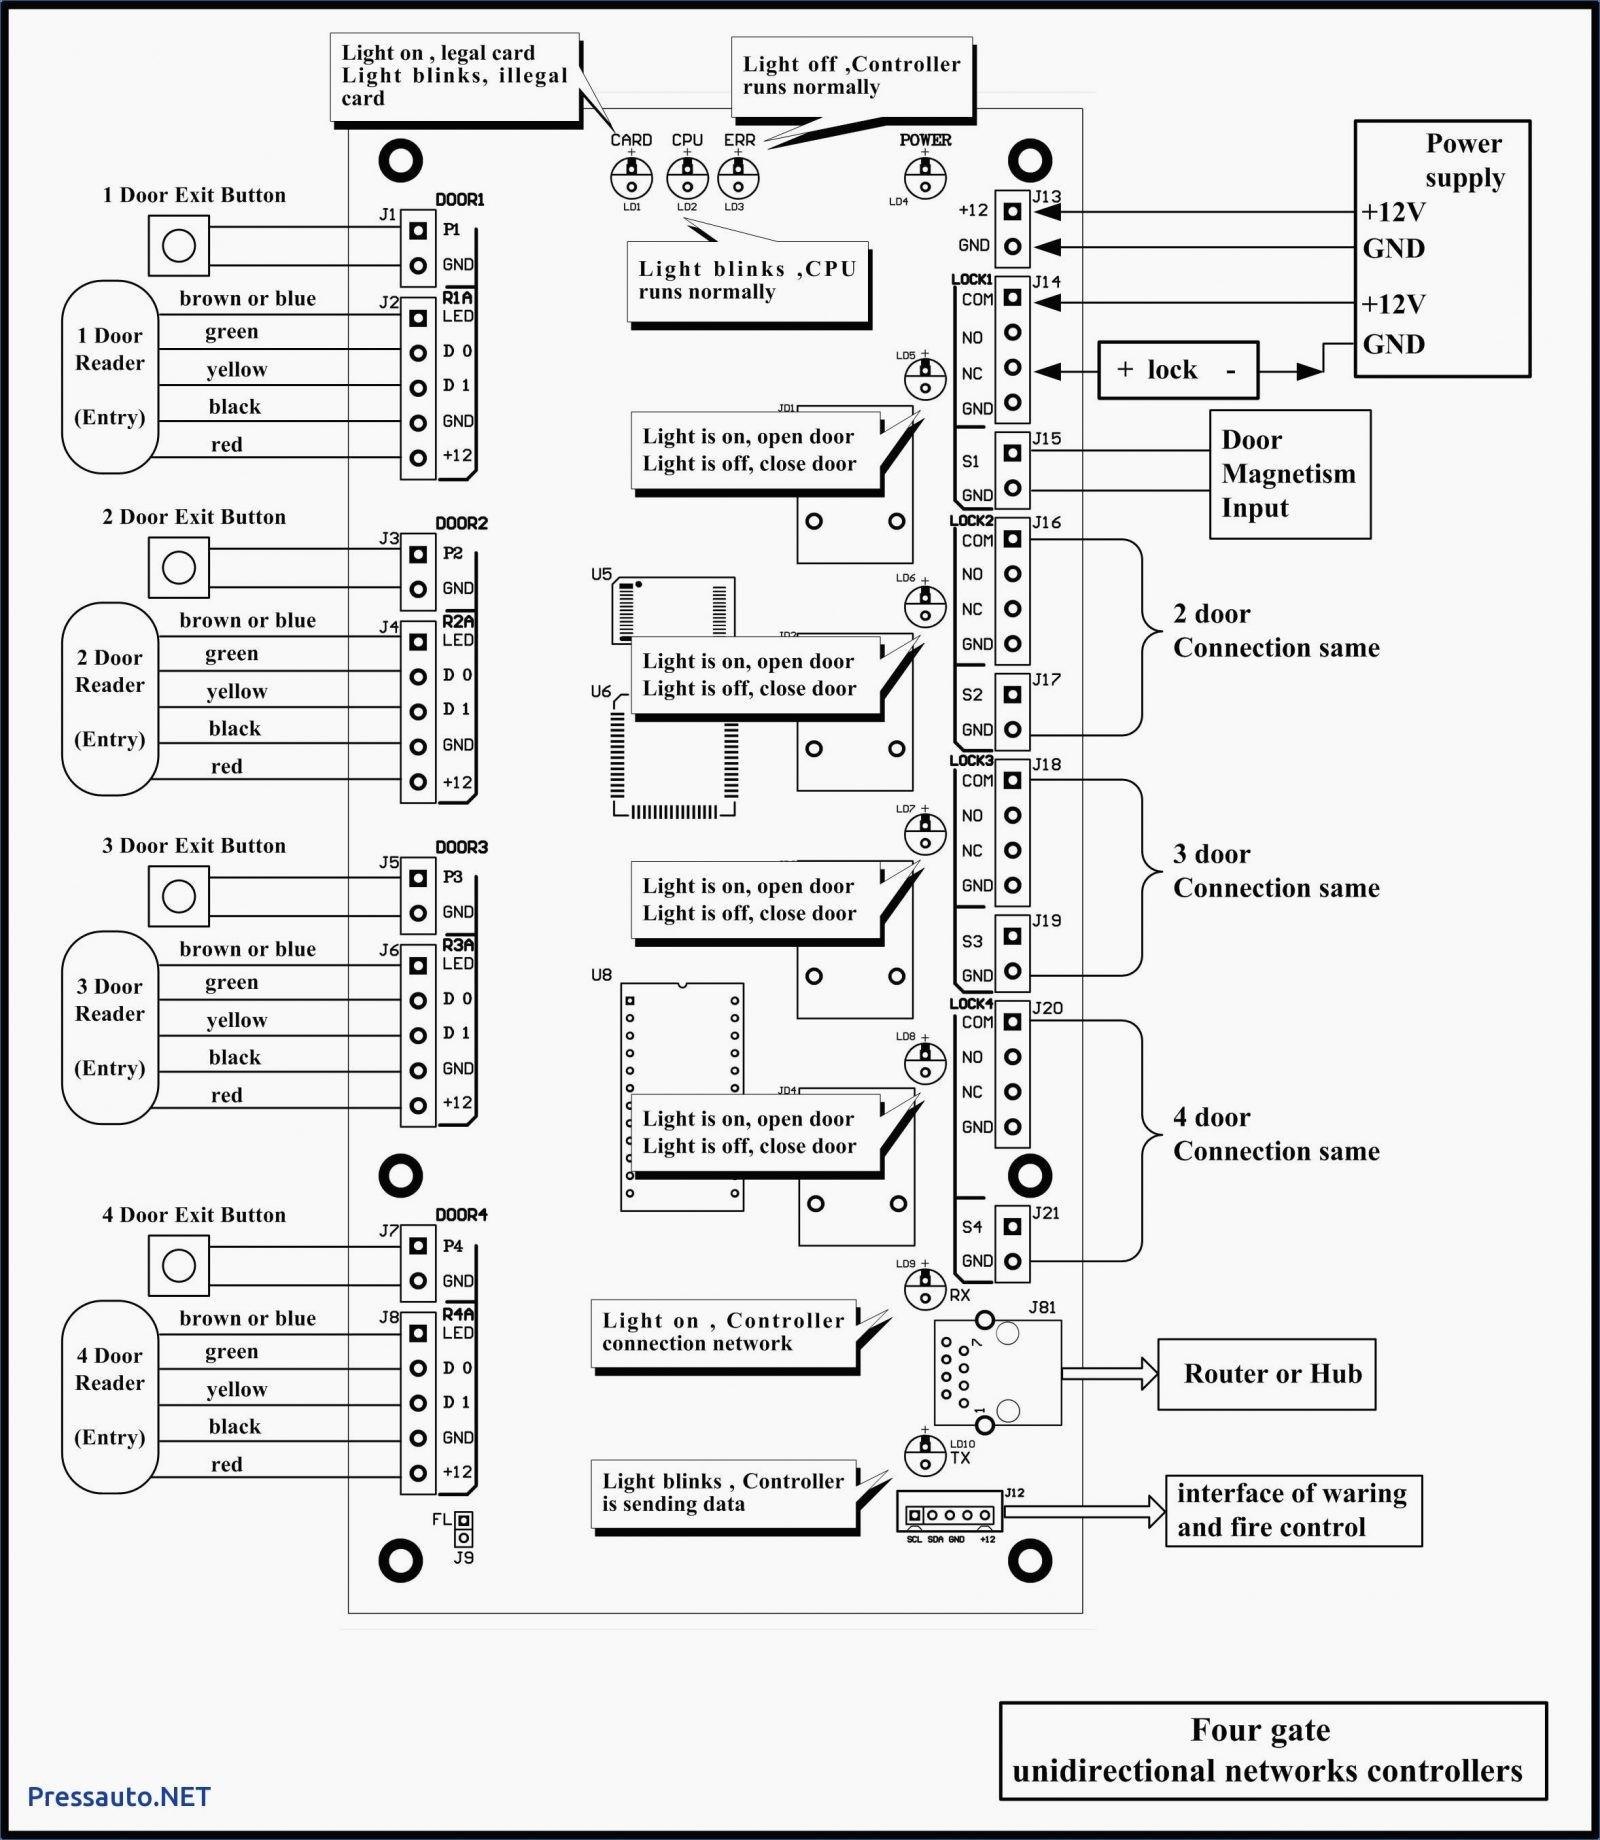 Jvc Radio Wiring Diagram Inspirational Jvc Wiring Harness Diagram Best Jvc Wiring Harness Diagram Luxury